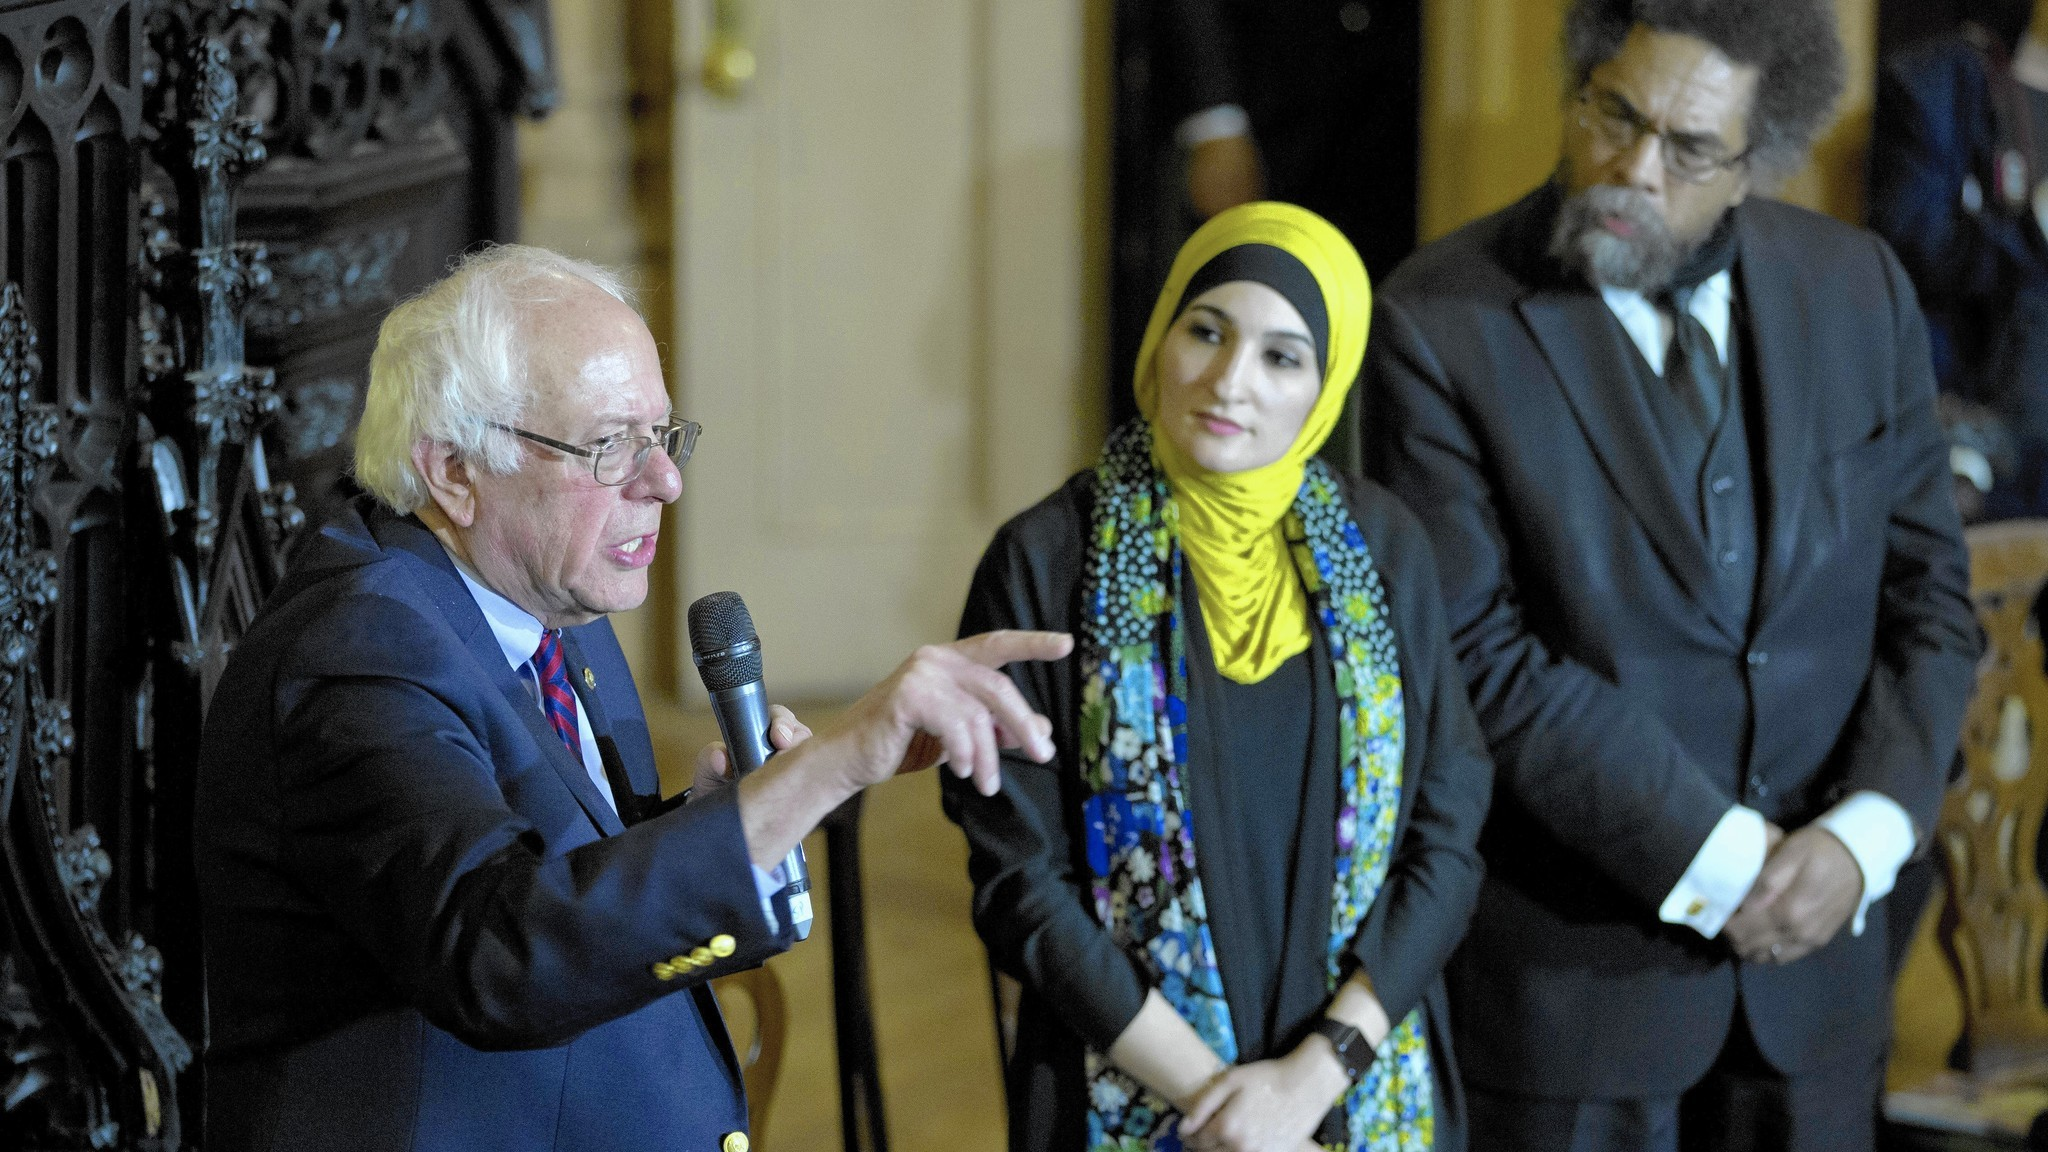 Lovable Bernie whacks Israel - Chicago Tribune